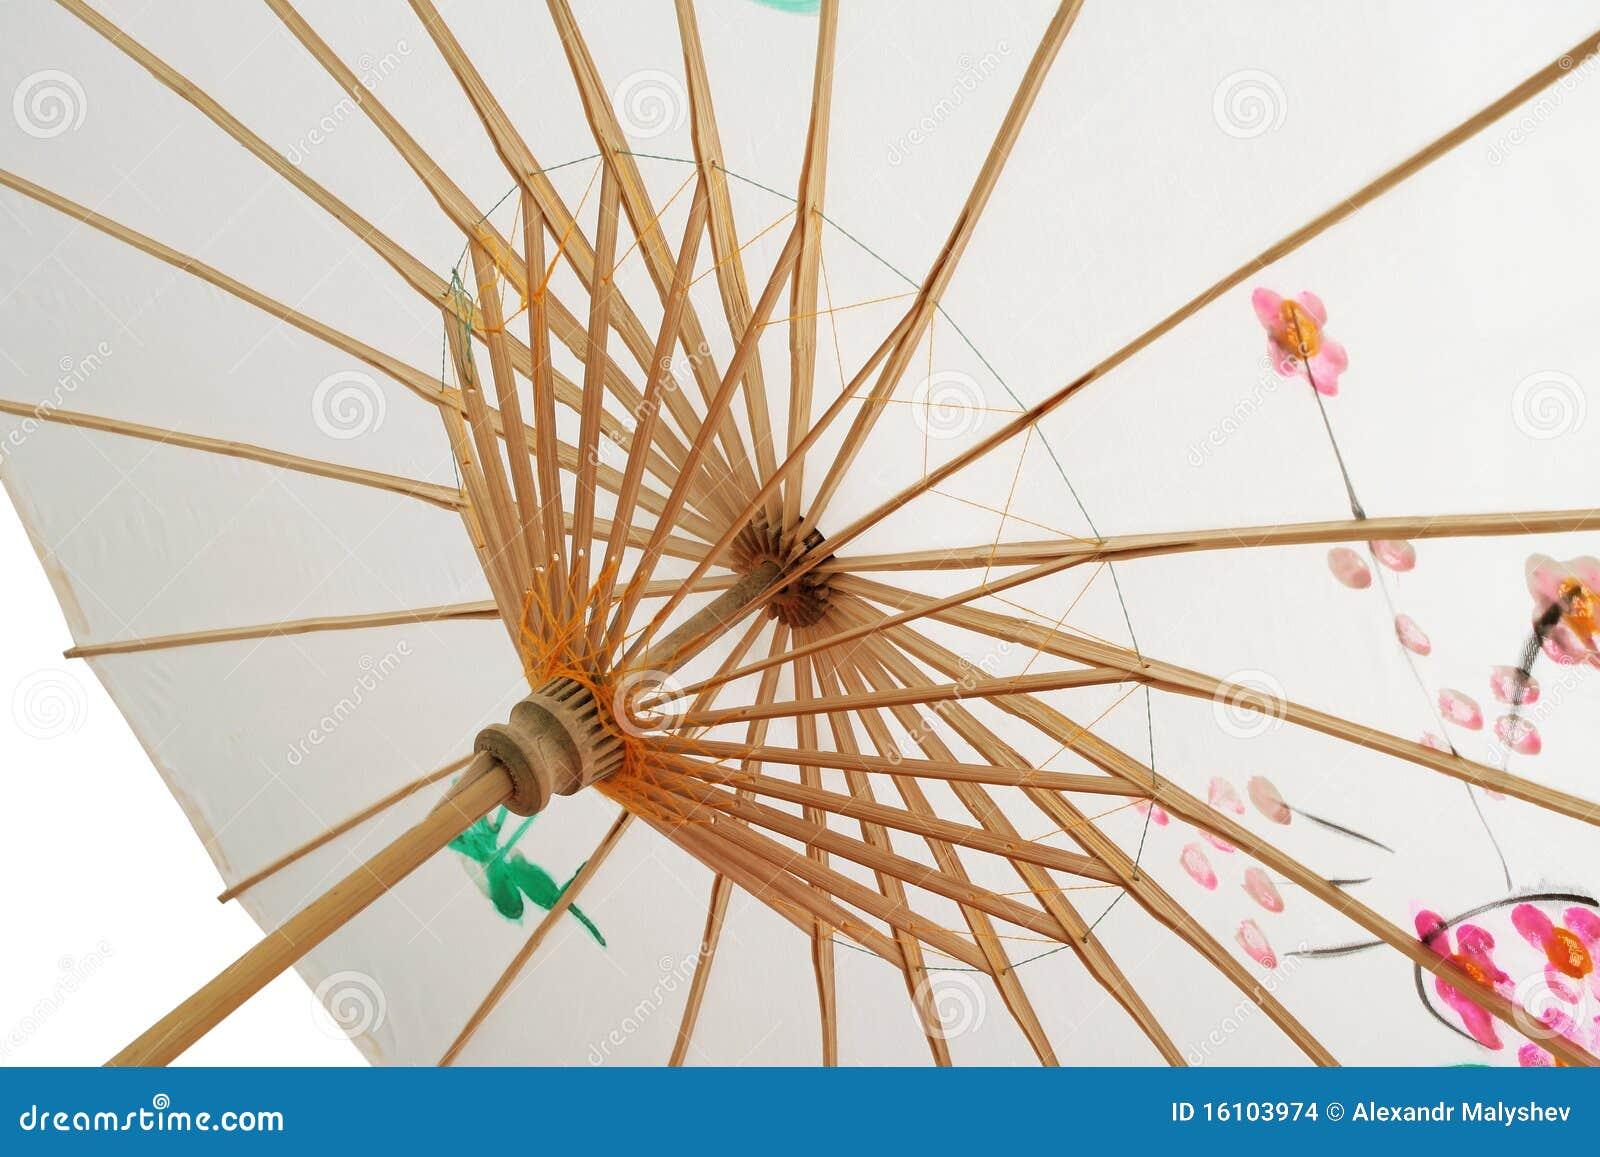 Parasol chinois. photo stock. Image du soie, bambou, parasol